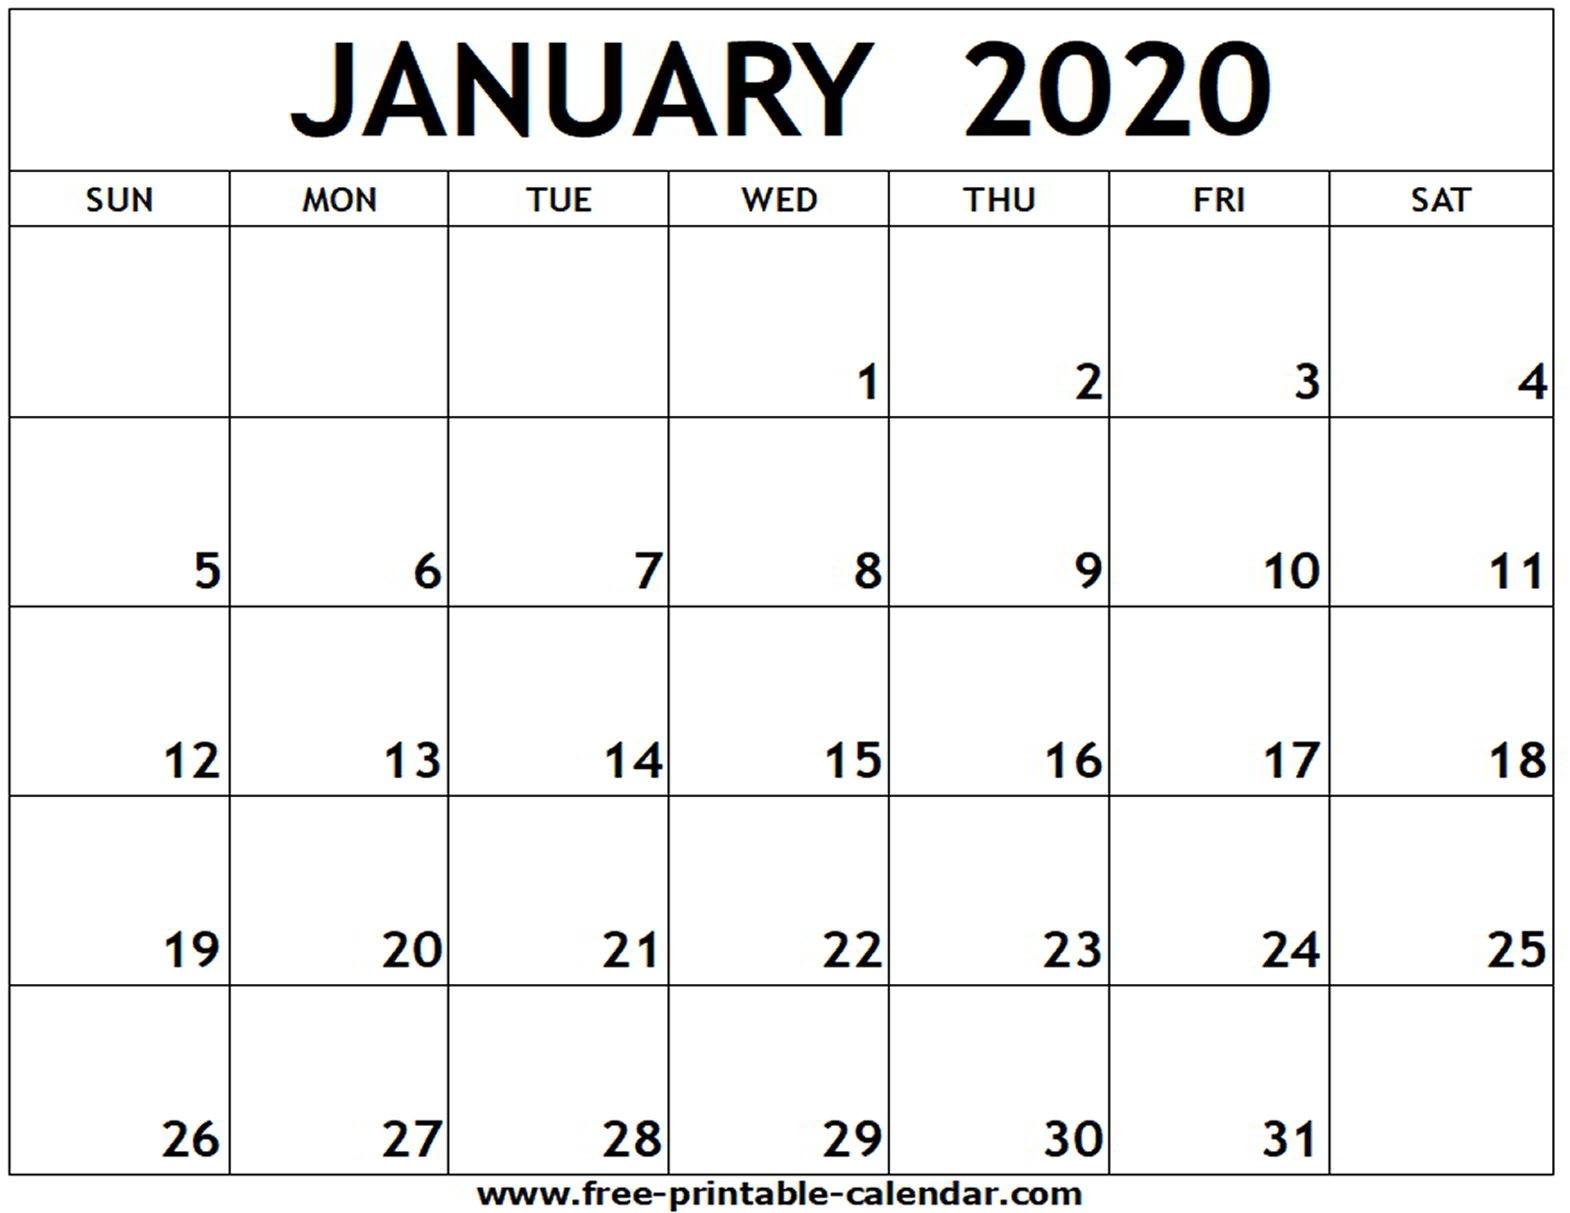 January 2020 Printable Calendar - Free-Printable-Calendar-January 2020 Calendar Jpg